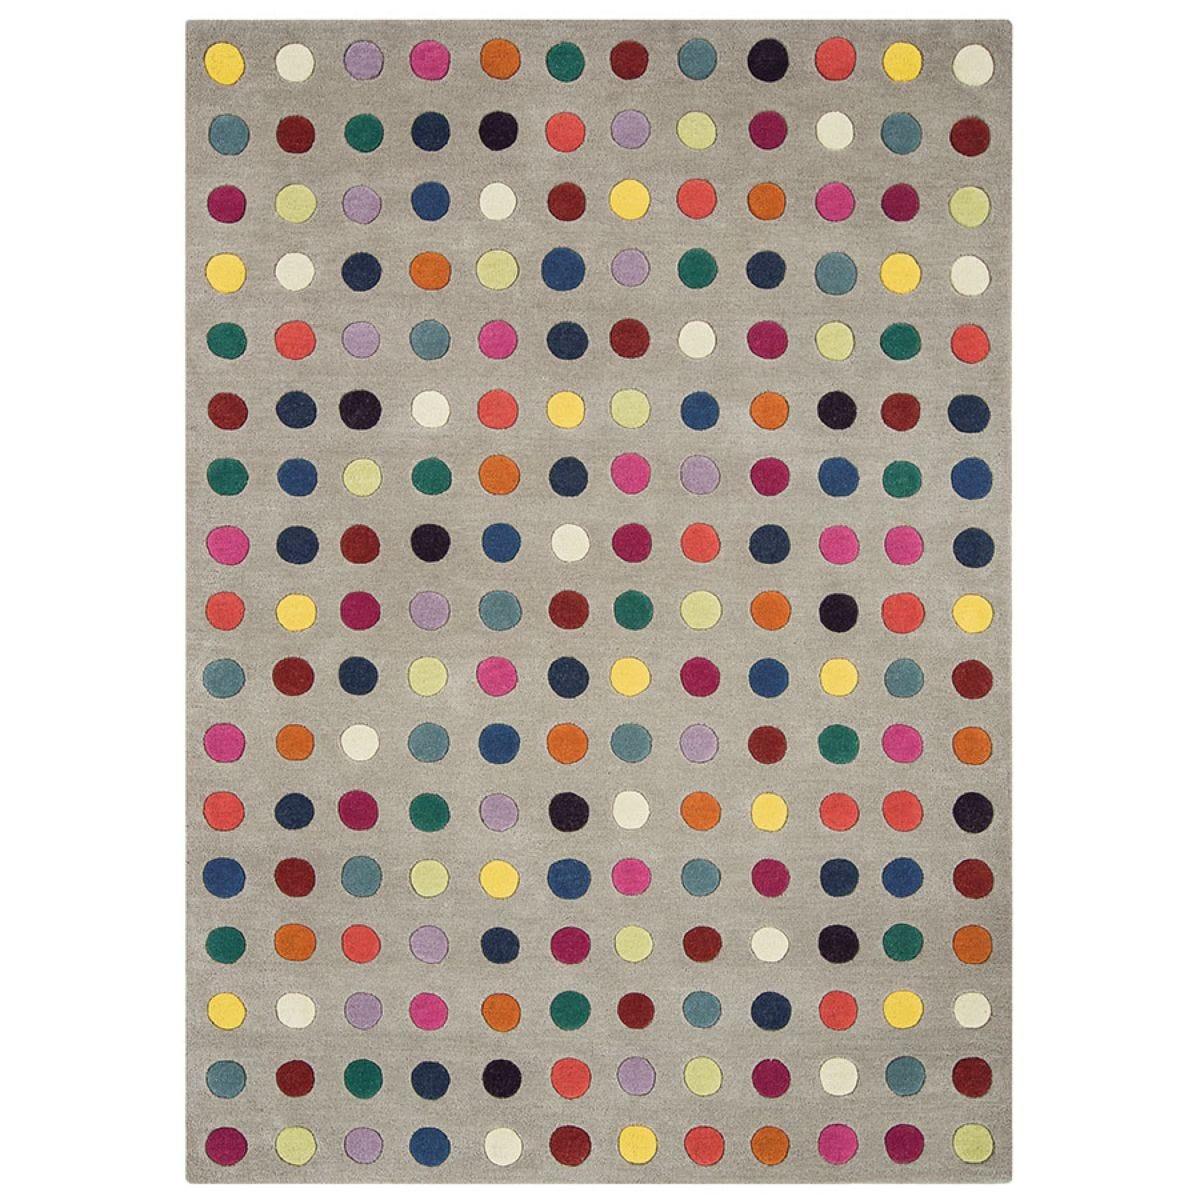 Asiatic Funk Rug, 170 x 120cm - Spots